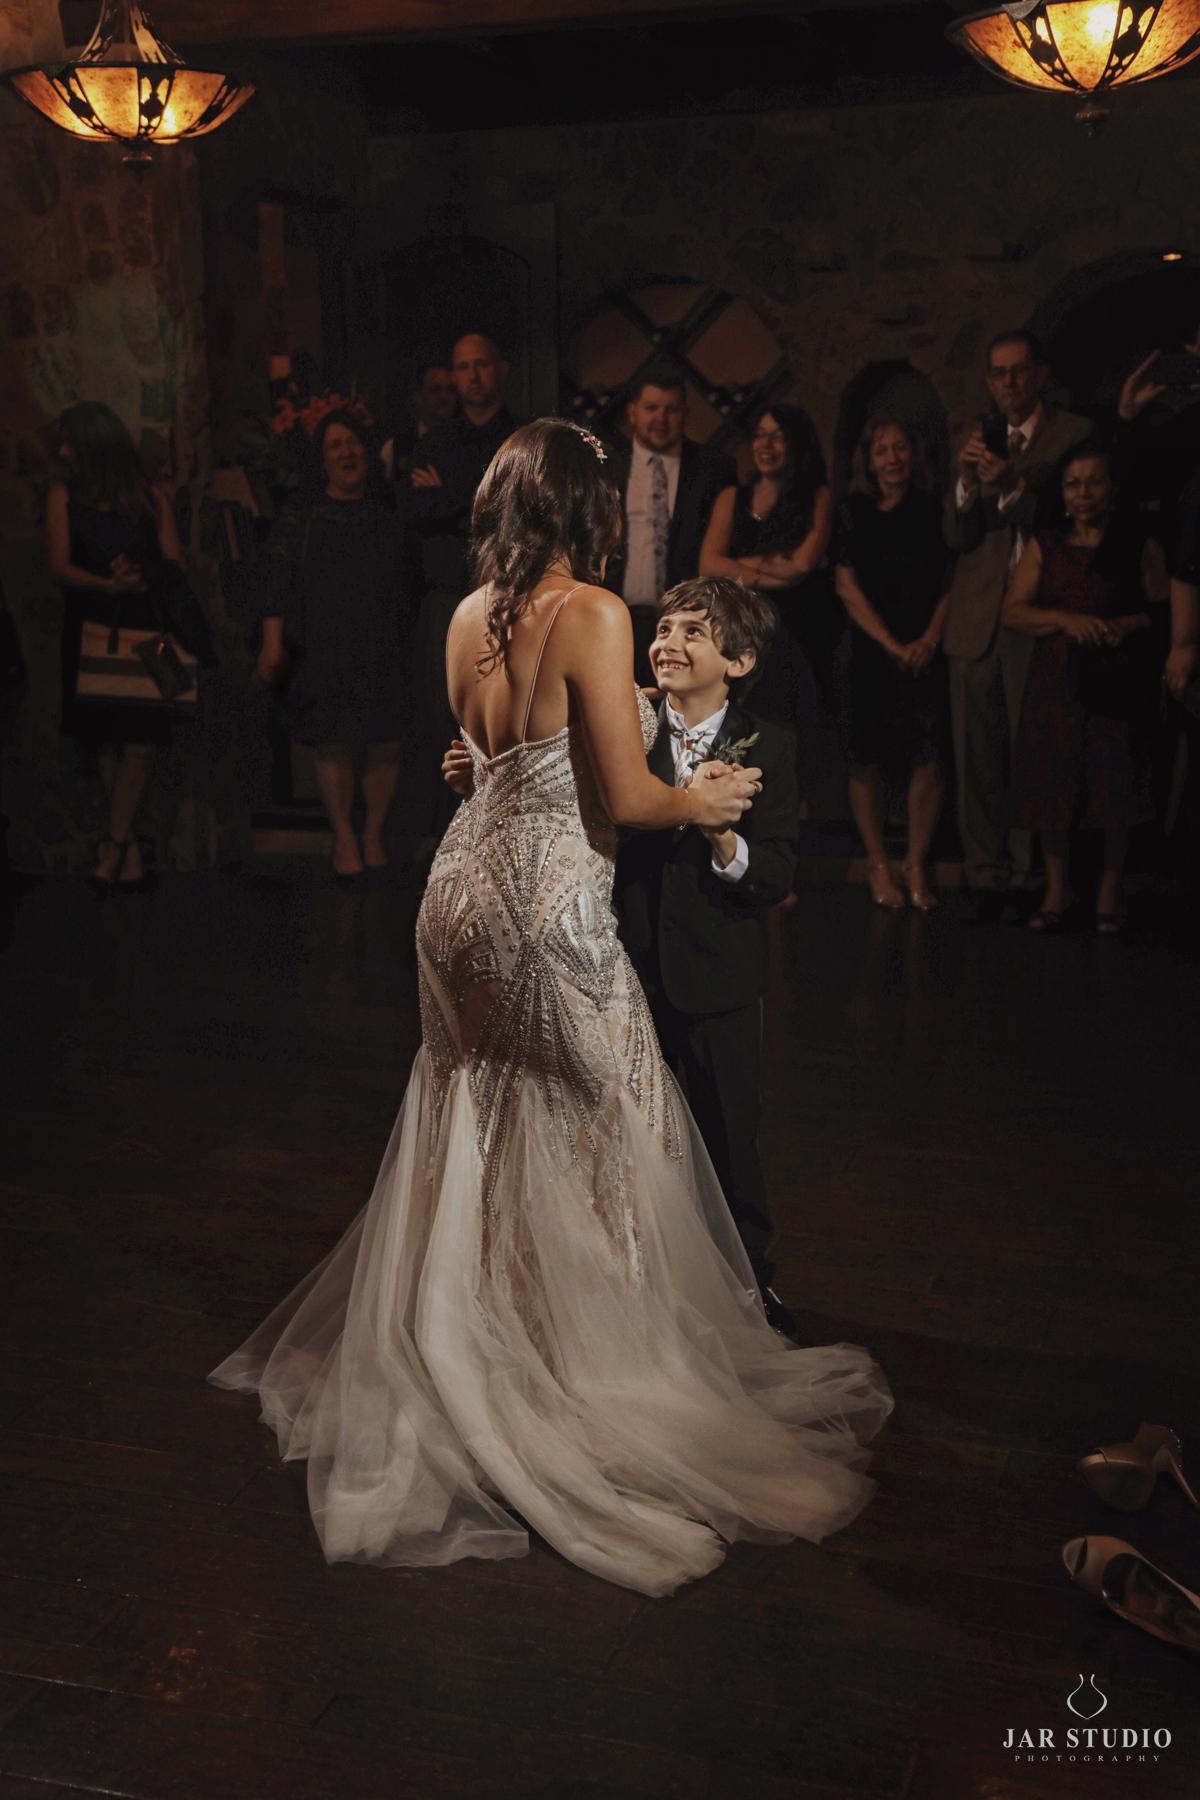 39-mother-son-cuttest-dance-wedding-photography-jarstudio.jpg